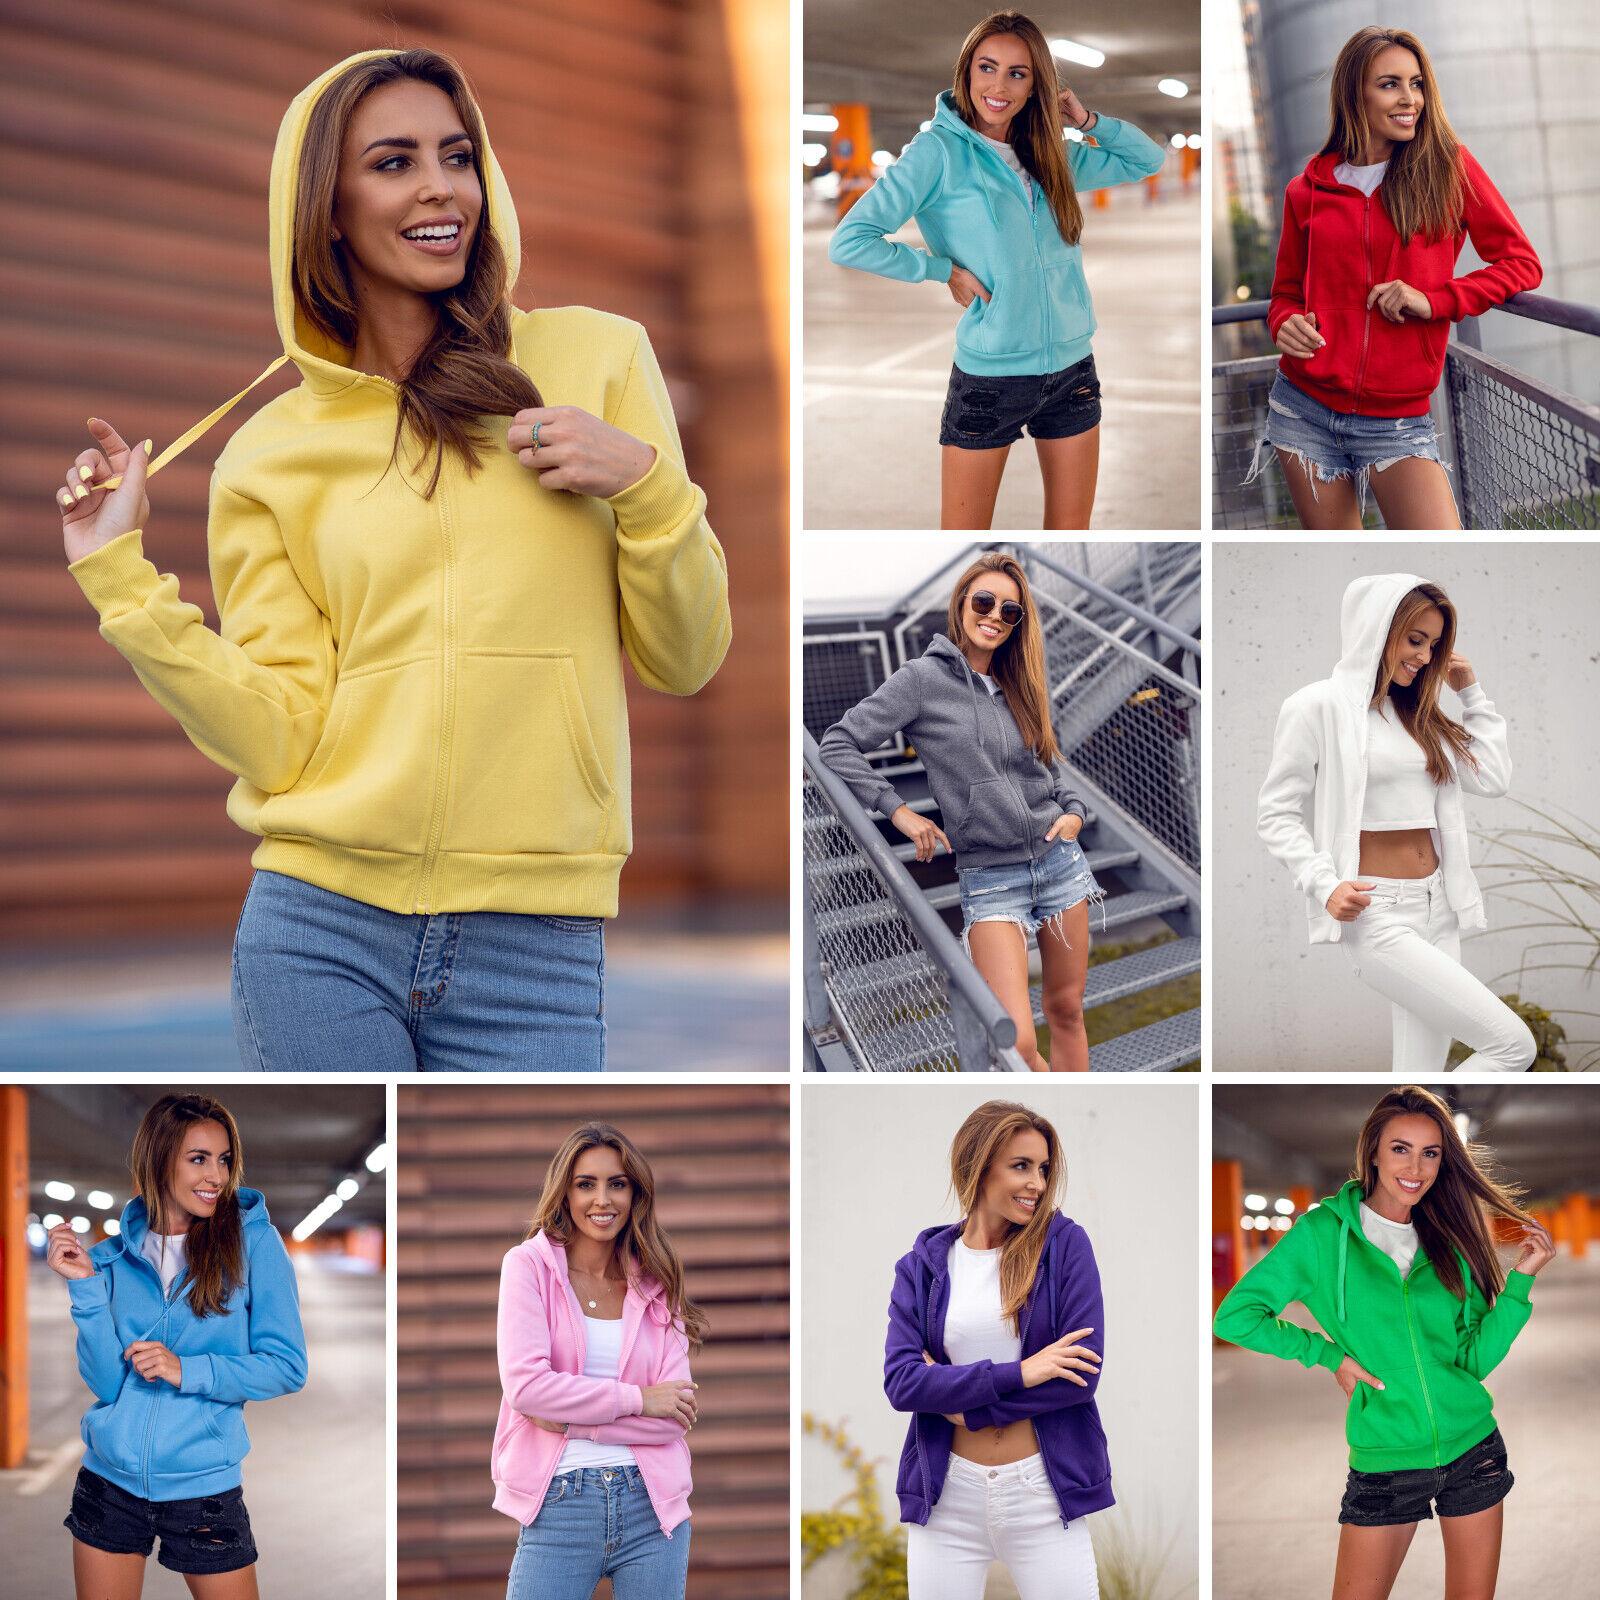 Kapuzenpullover Sweatjacke Sweatshirt Unifarben Basic Sport Damen BOLF Kapuze